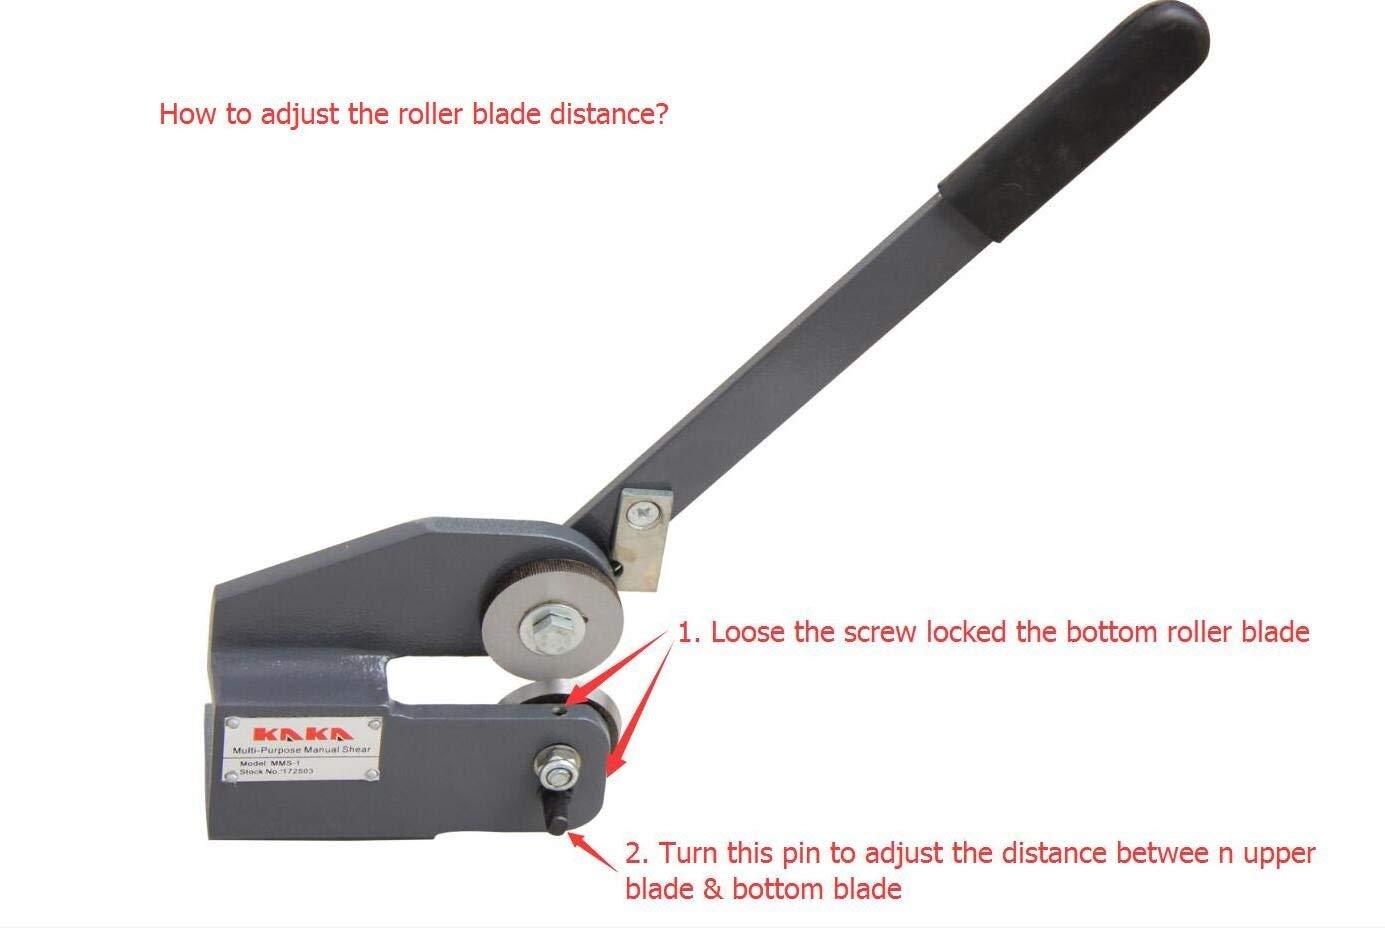 Kaka MMS-1 Multi-Purpose Bench Top Manual Shear, Sheet Metal Throatless Shear by KAKA INDUSTRIAL